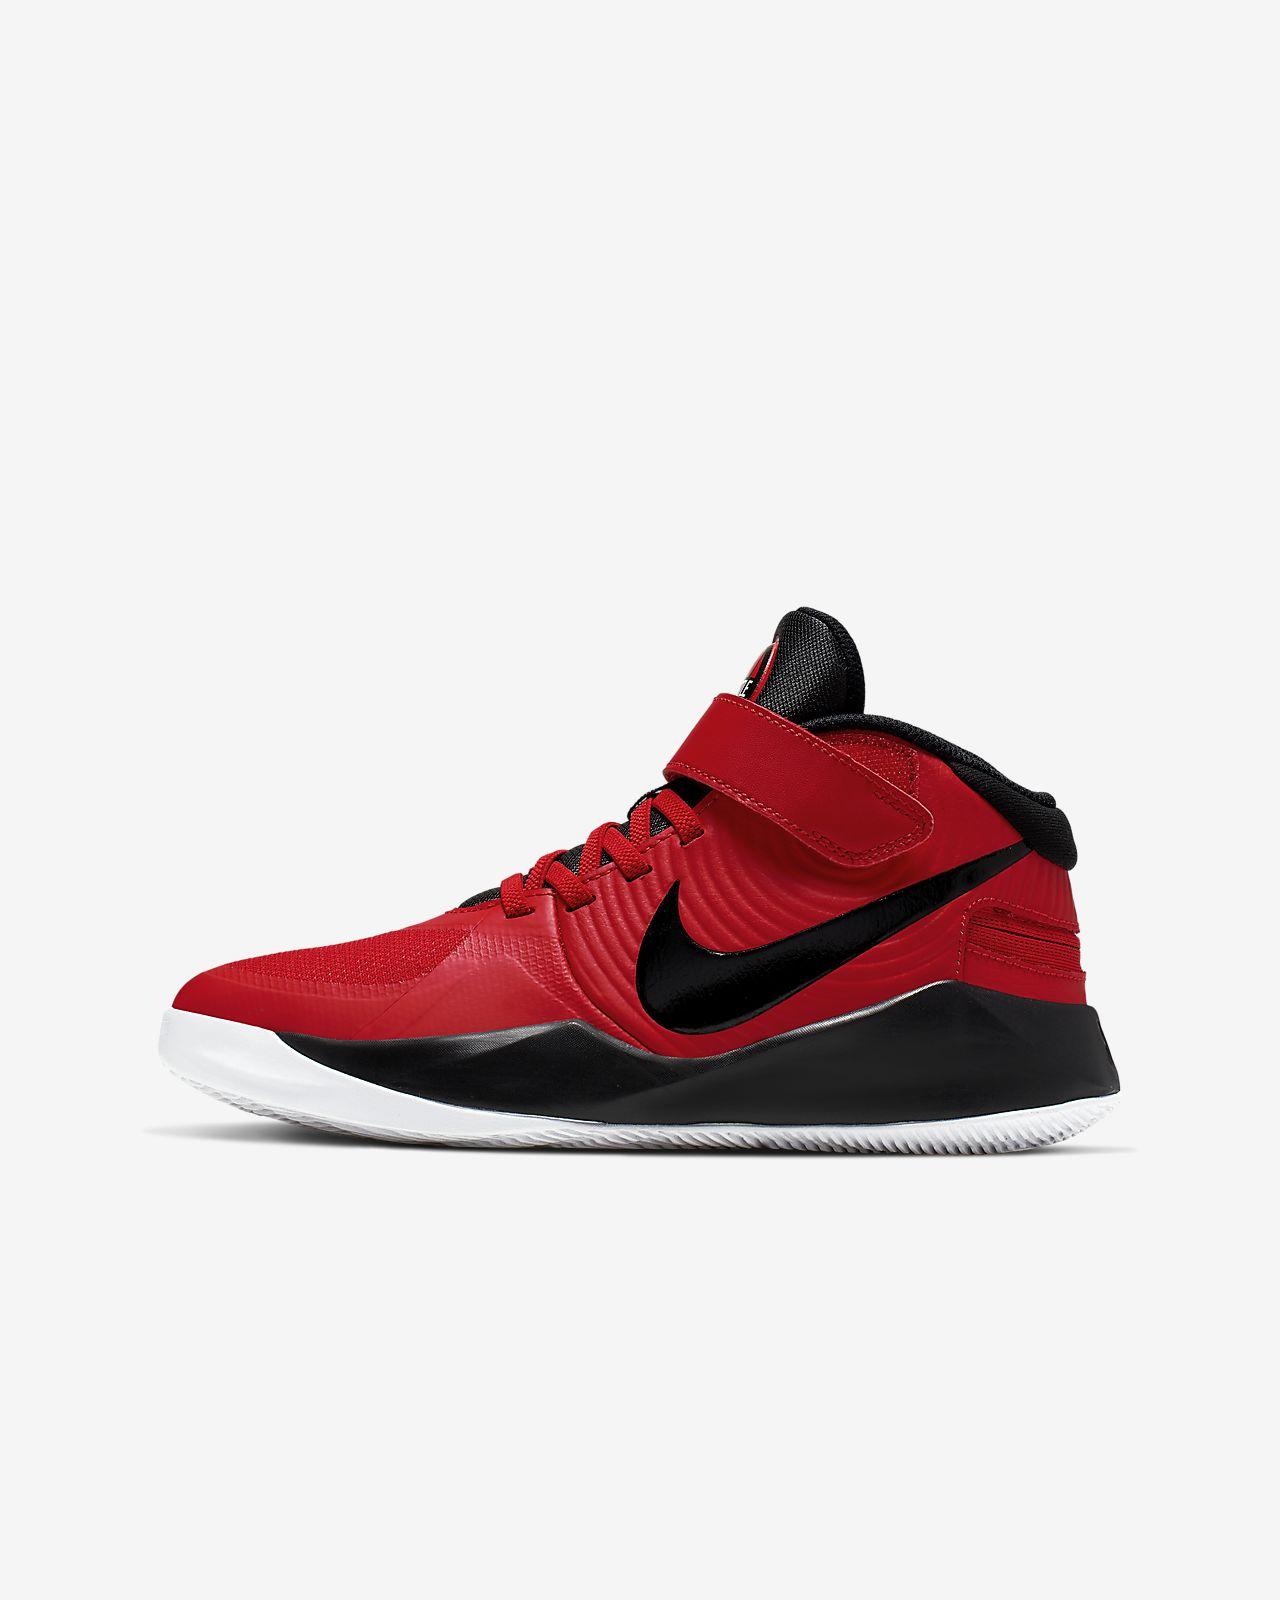 Nike Team Hustle D 9 FlyEase Older Kids' Basketball Shoe